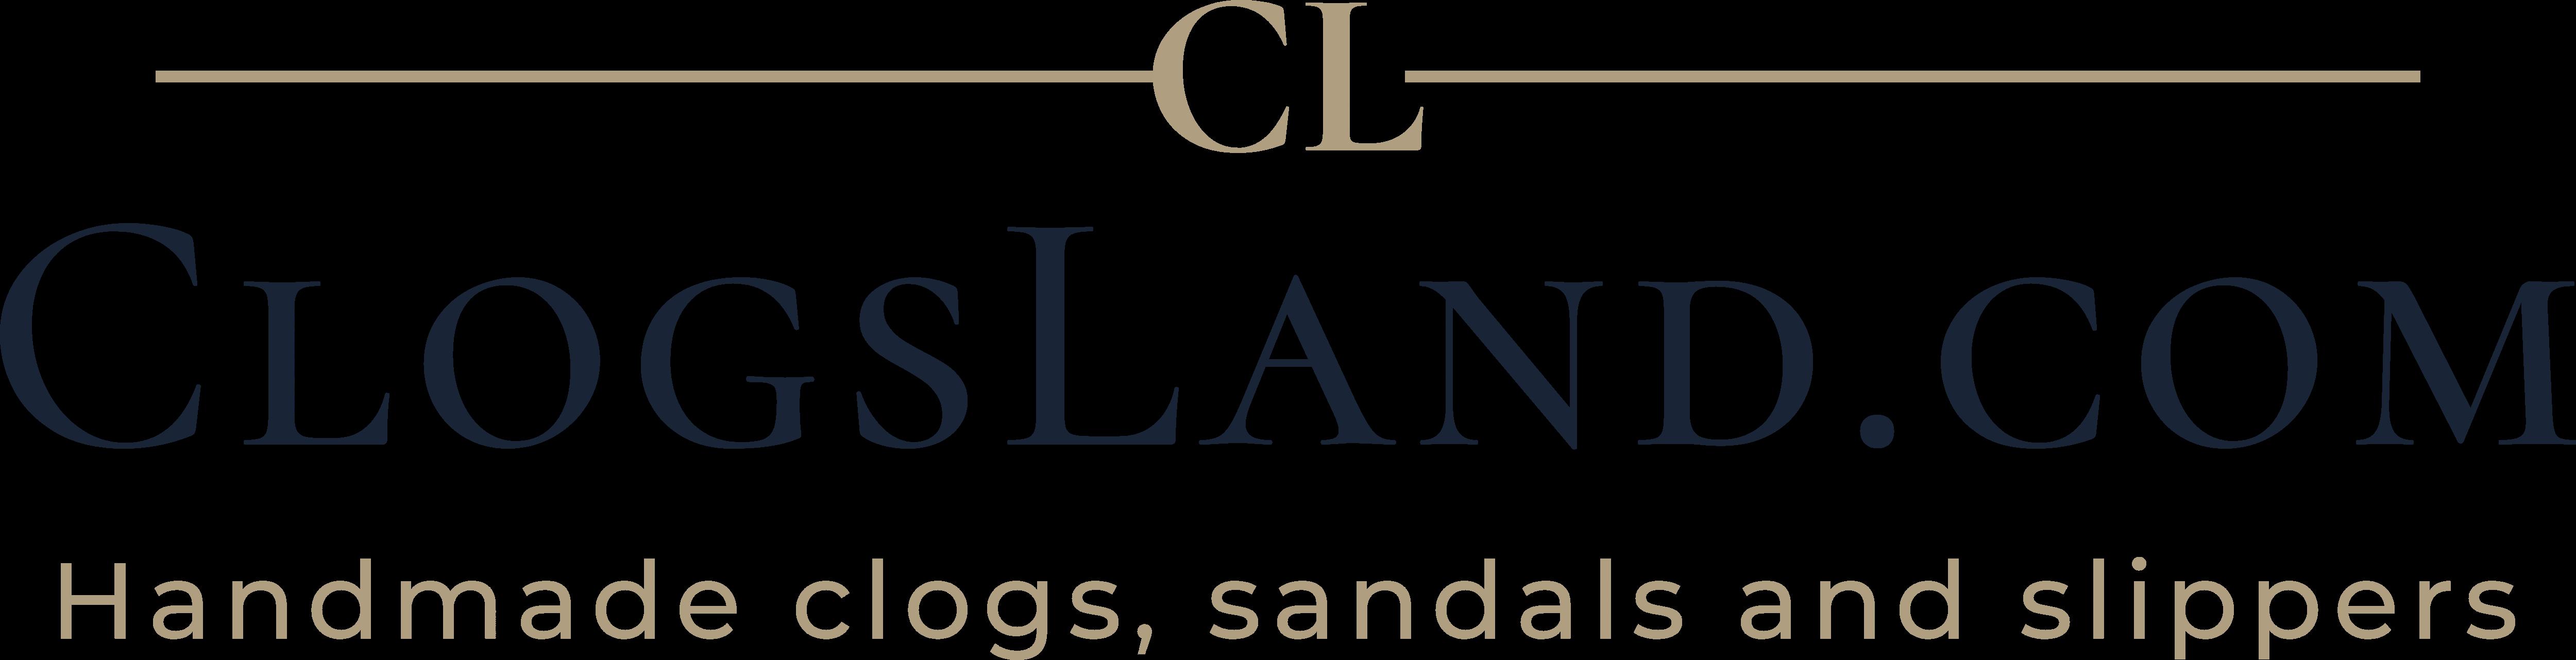 ClogsLand